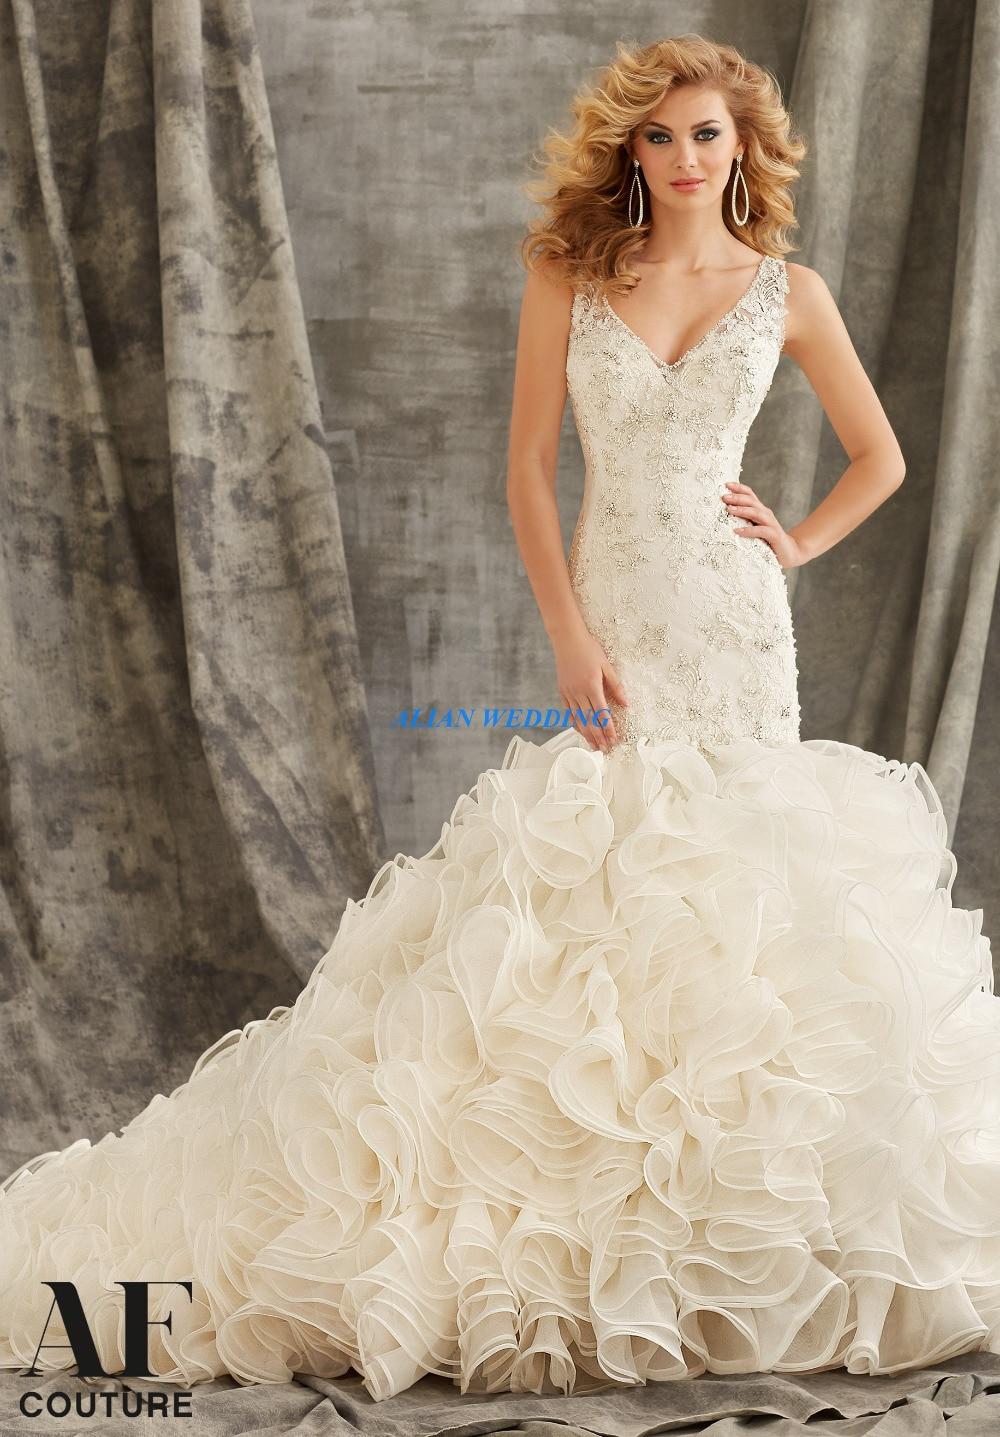 luxury wedding dresses new york mermaid vestidos de novia v neck beading bridal gowns lace organza ruffles free shipping nw3506